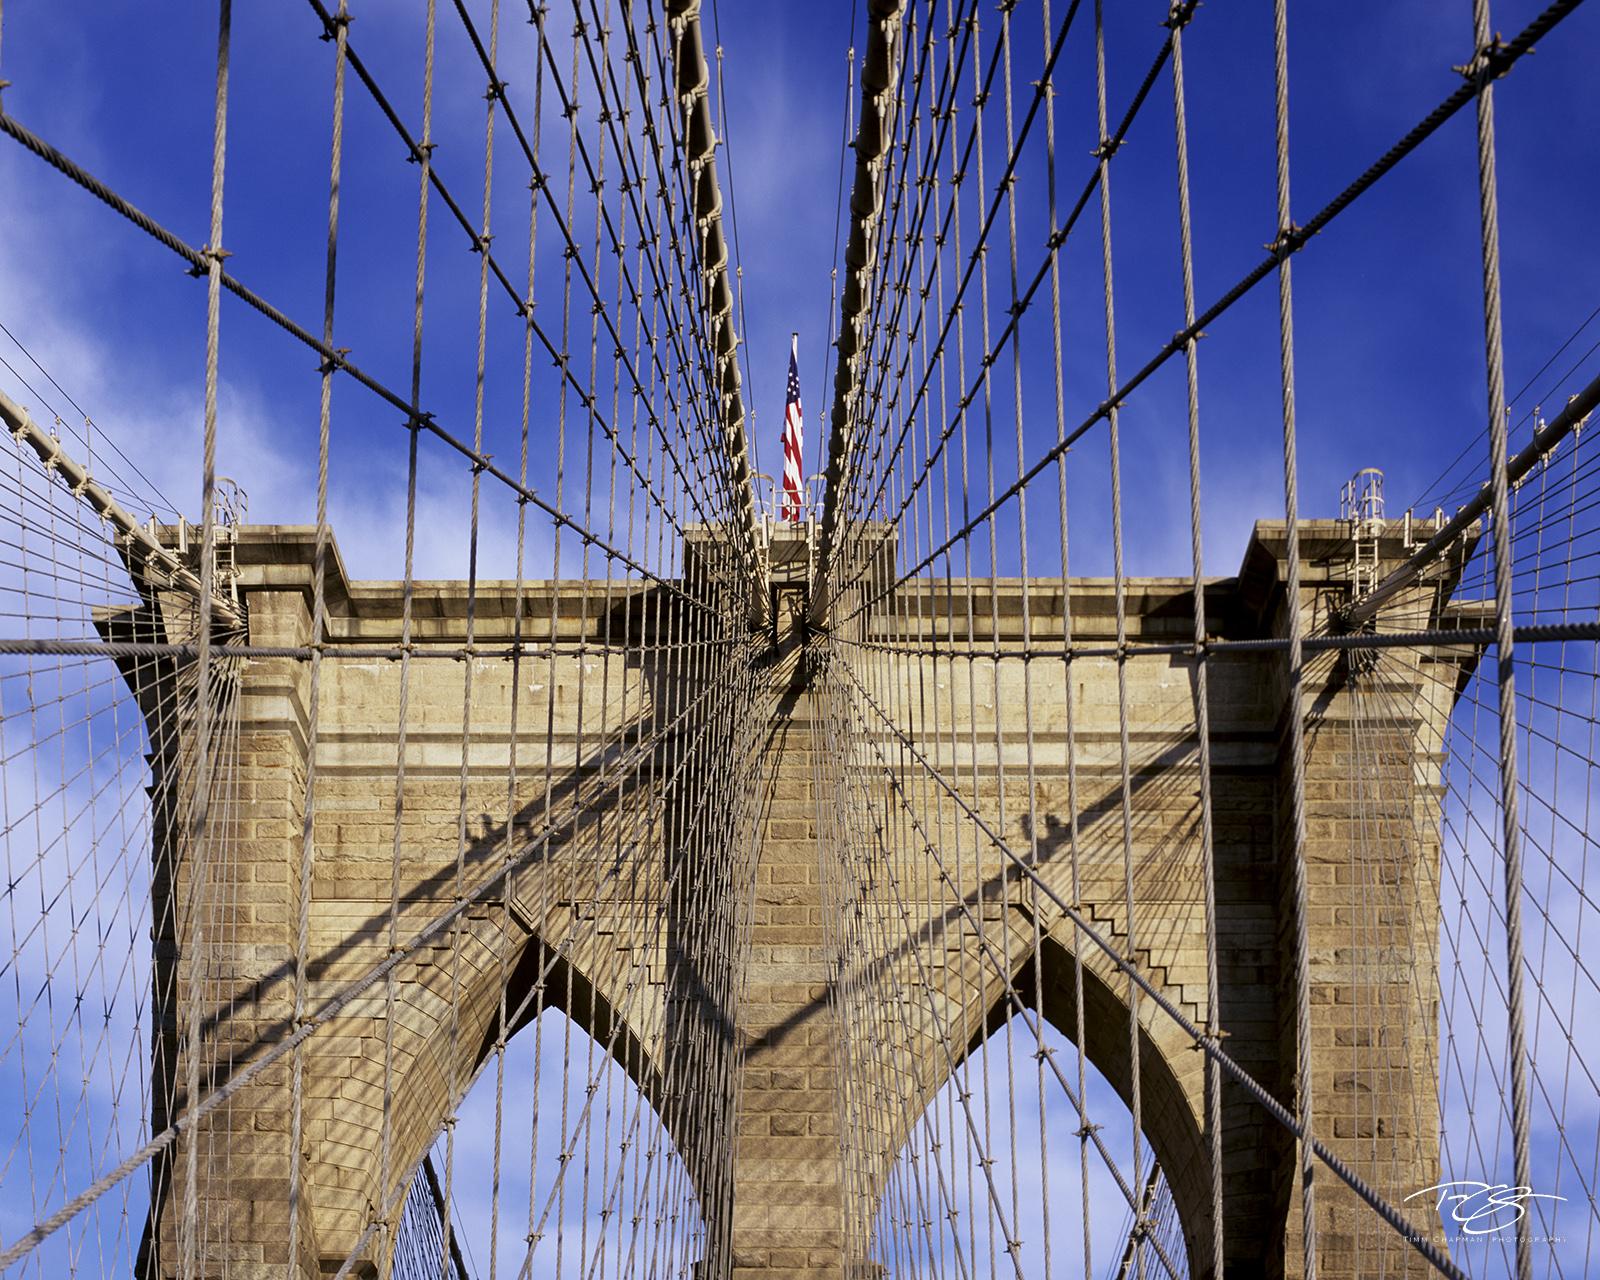 New York, NYC, New York City, Lower Manhattan, Brooklyn Bridge, suspension bridge, cable, stone, wire, flag, architecture architectural detail, bridge, photo